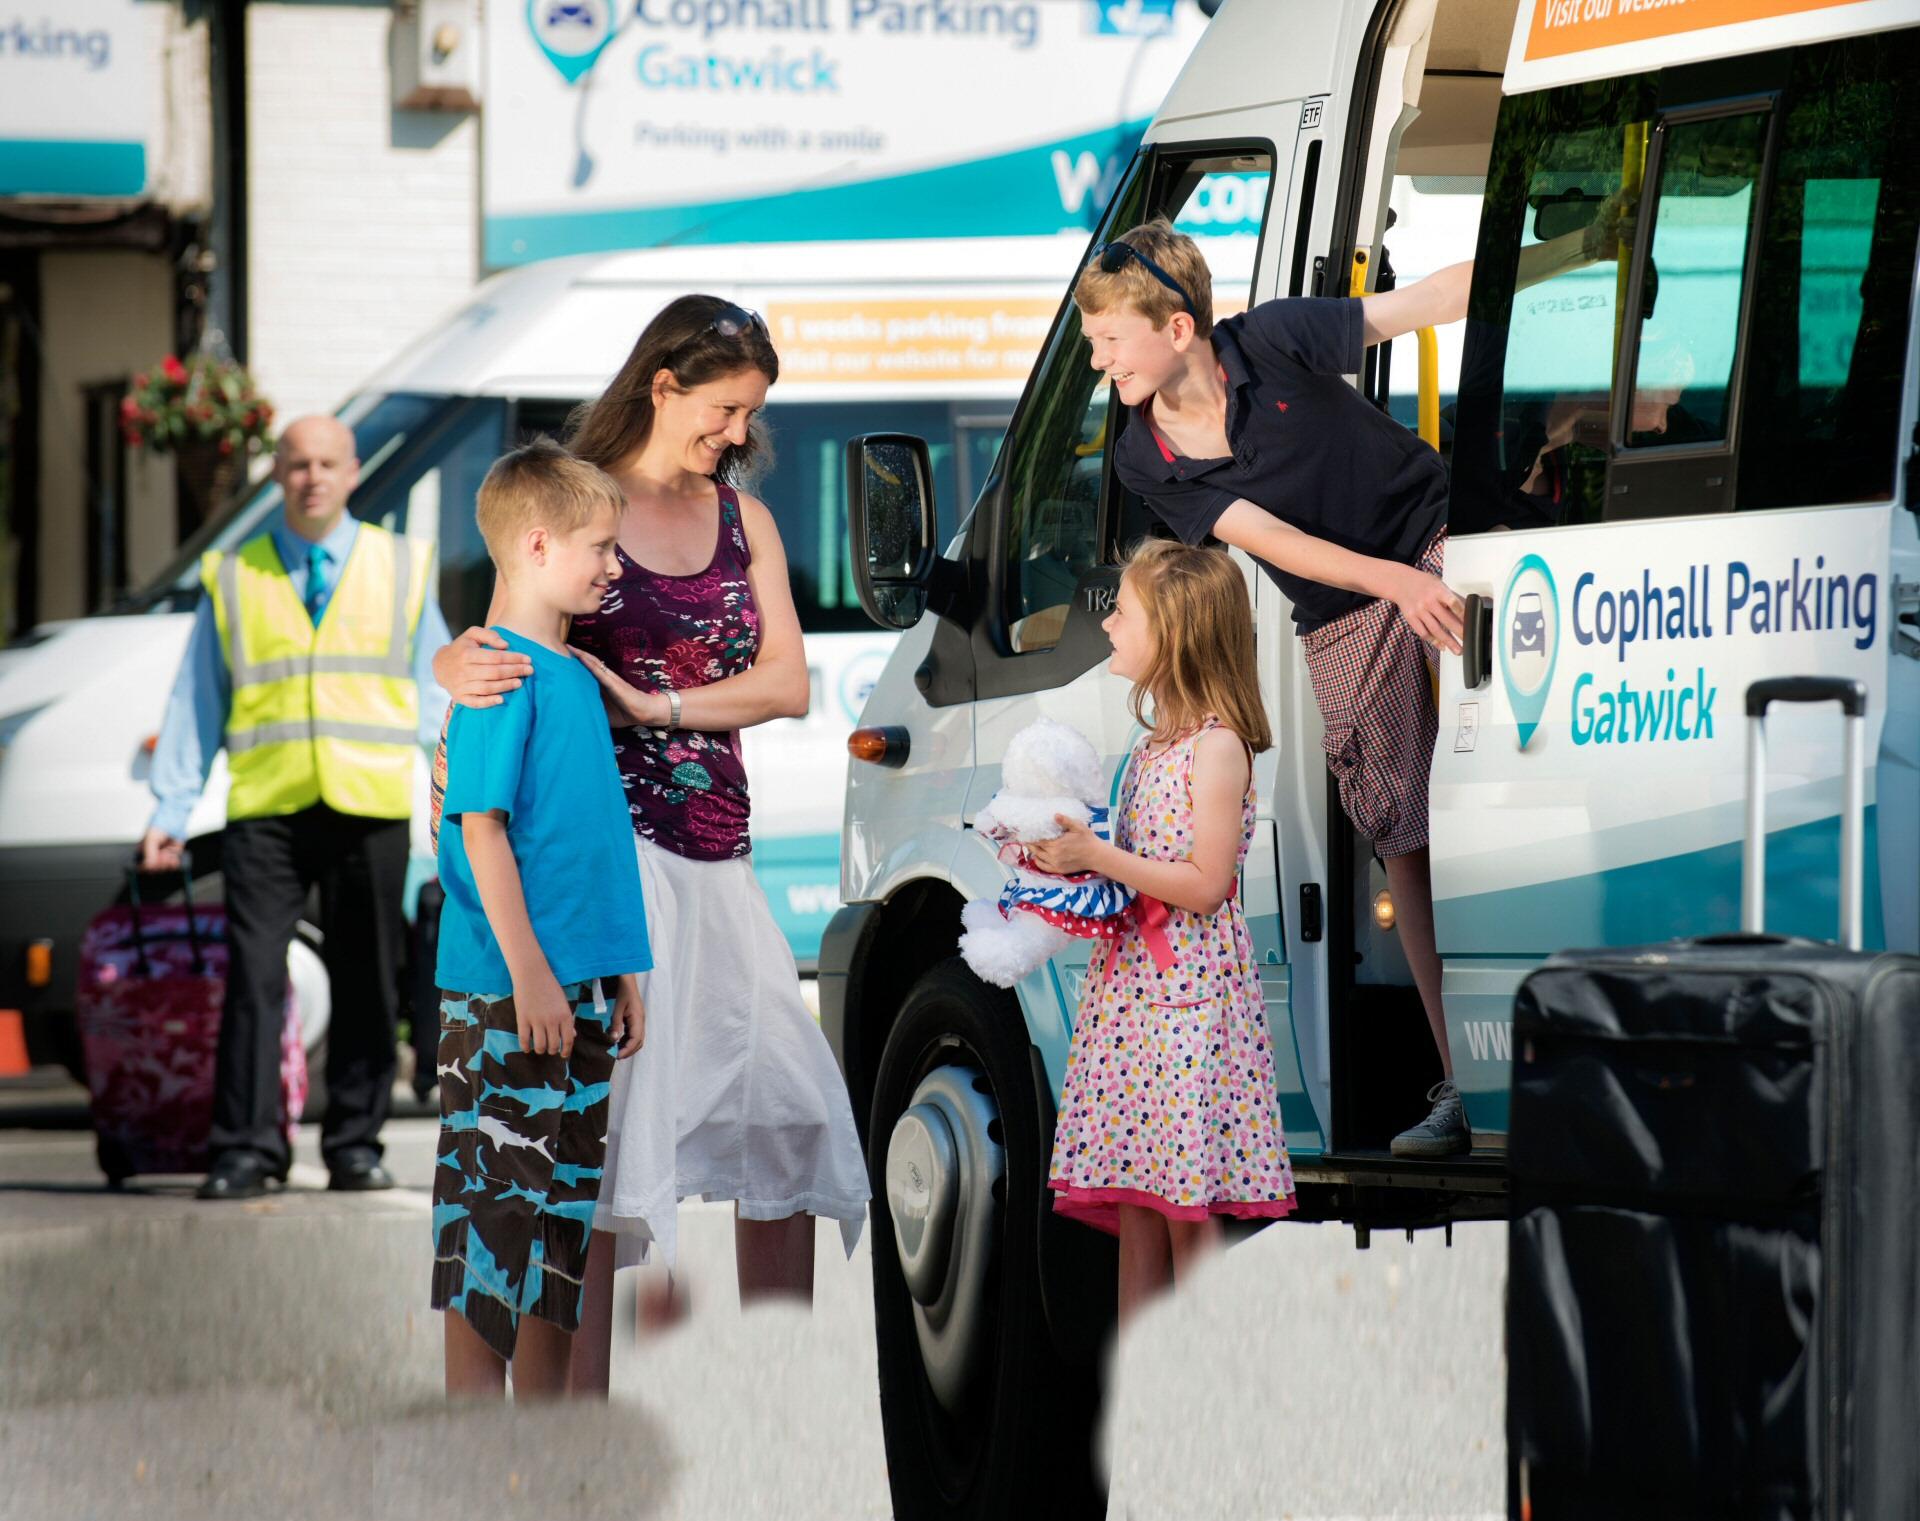 Cophall transfer bus